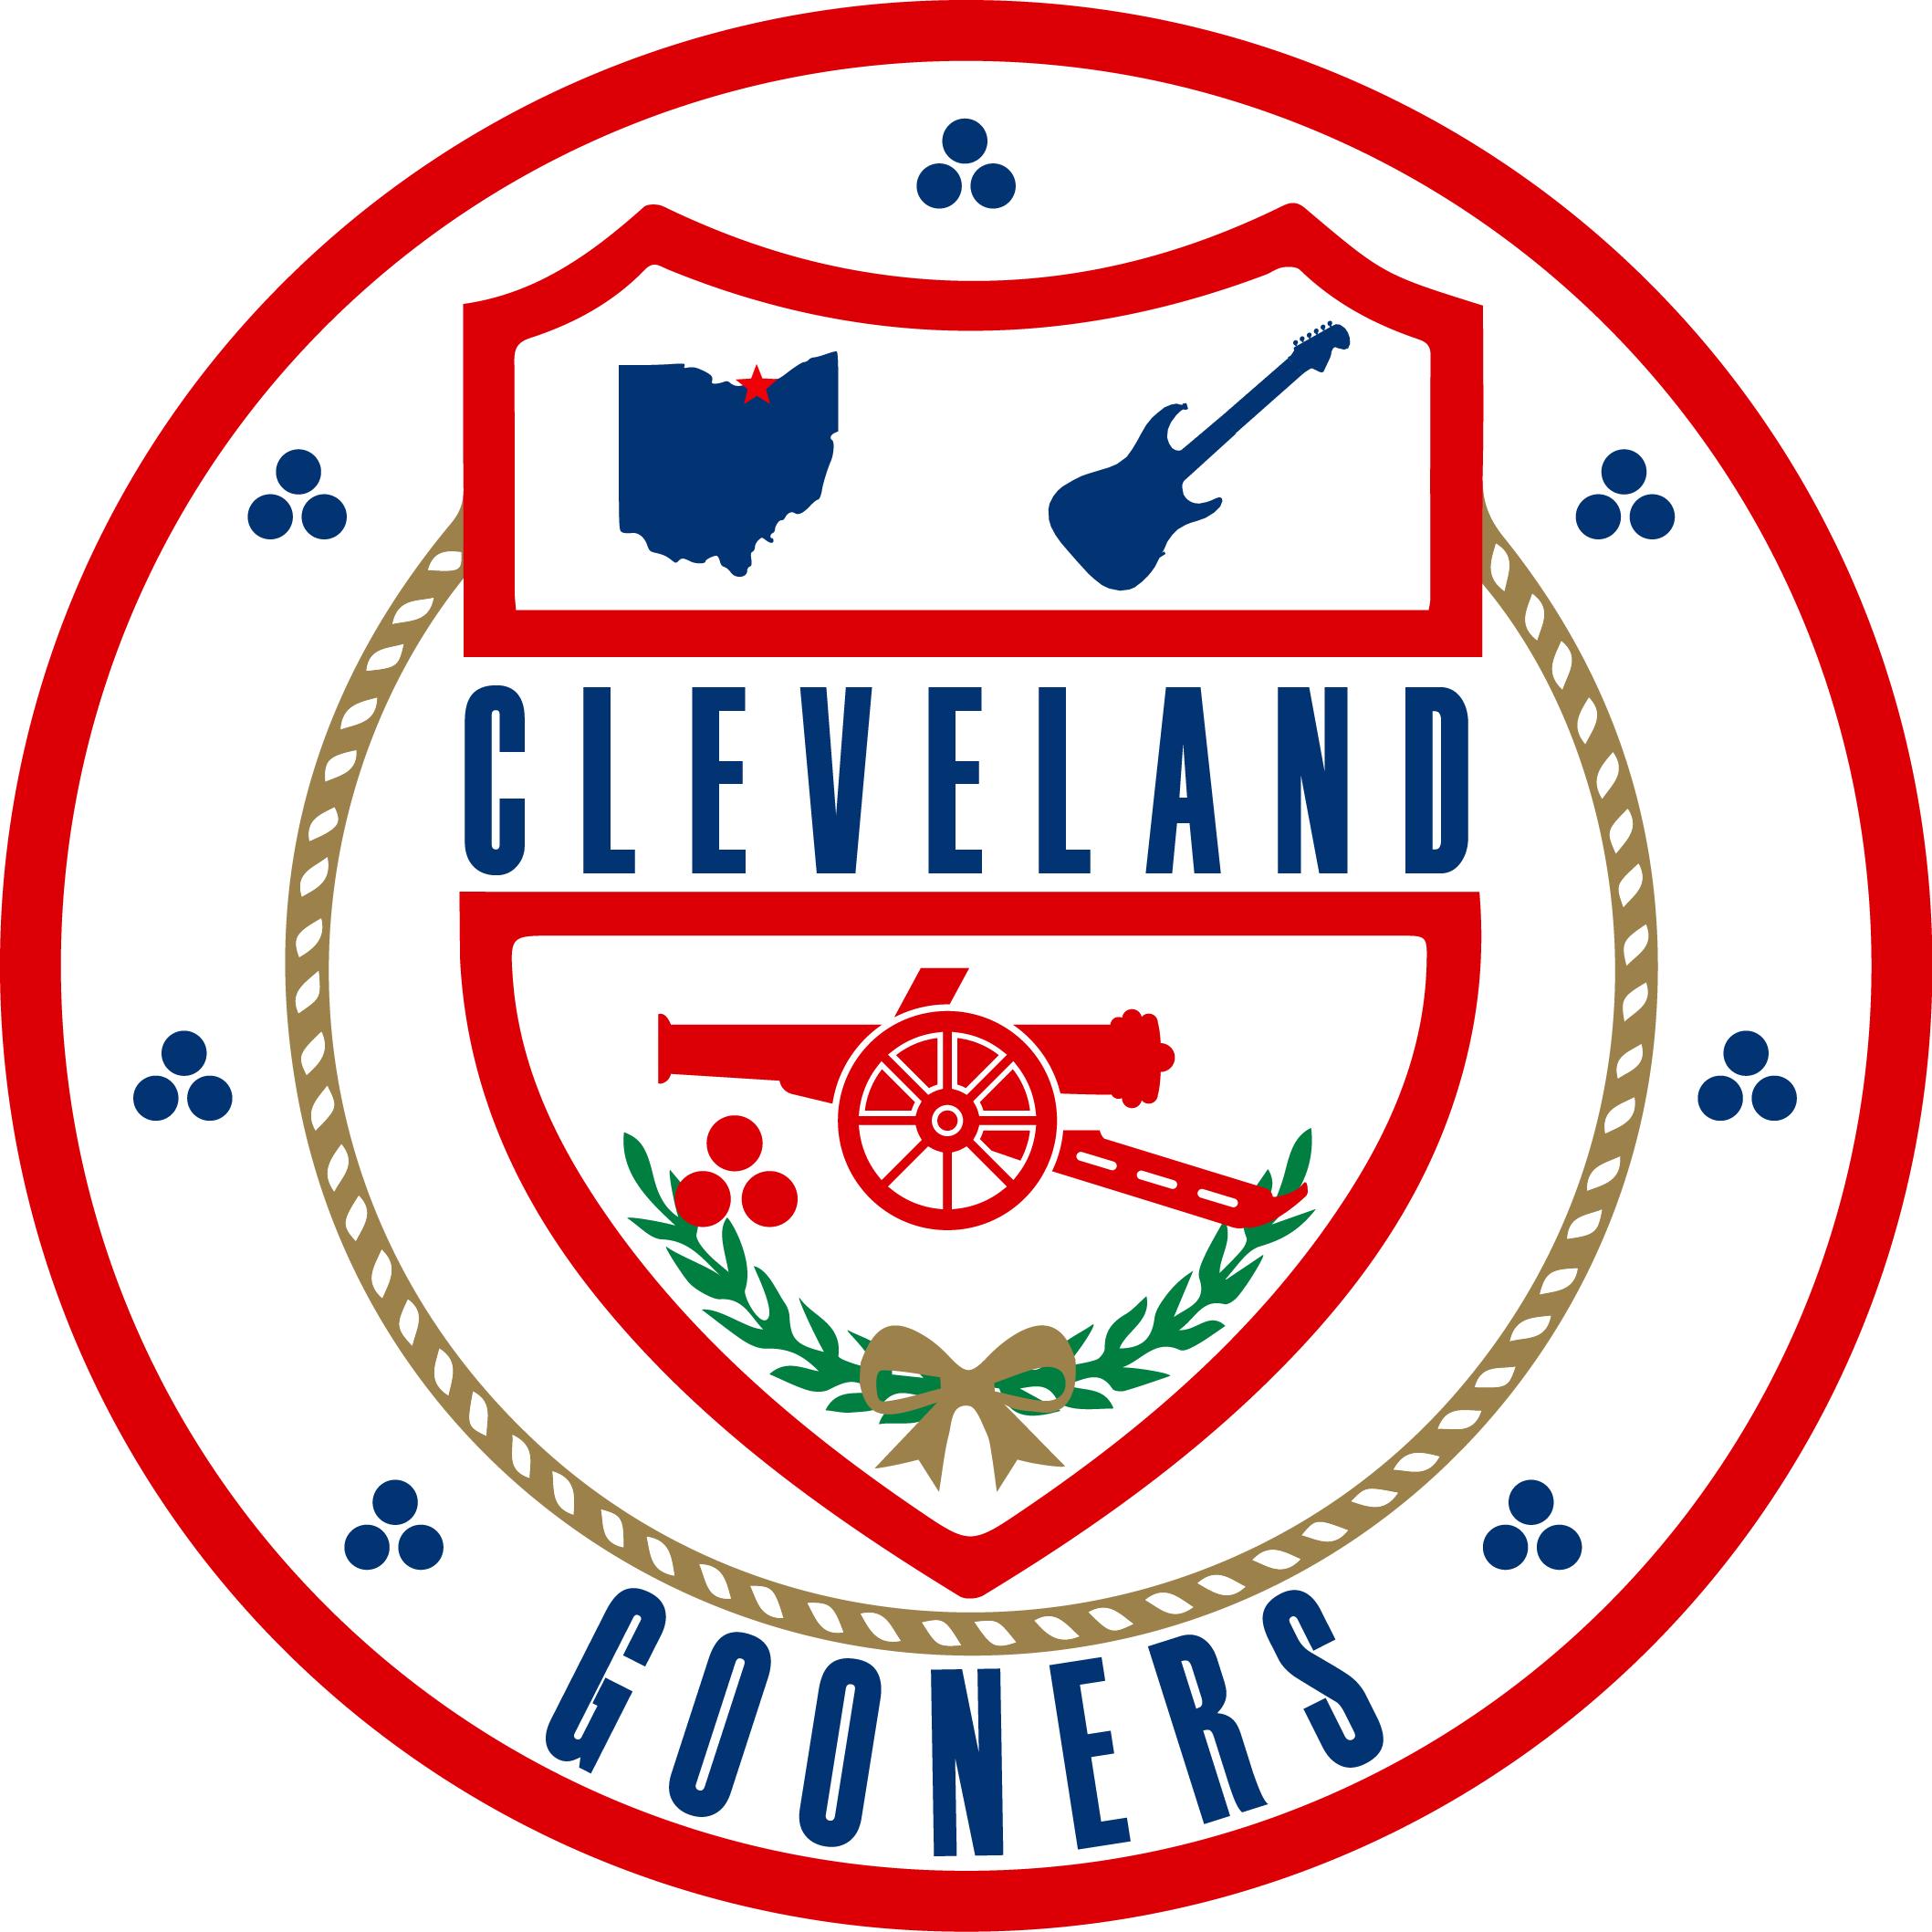 Cleveland Gooners